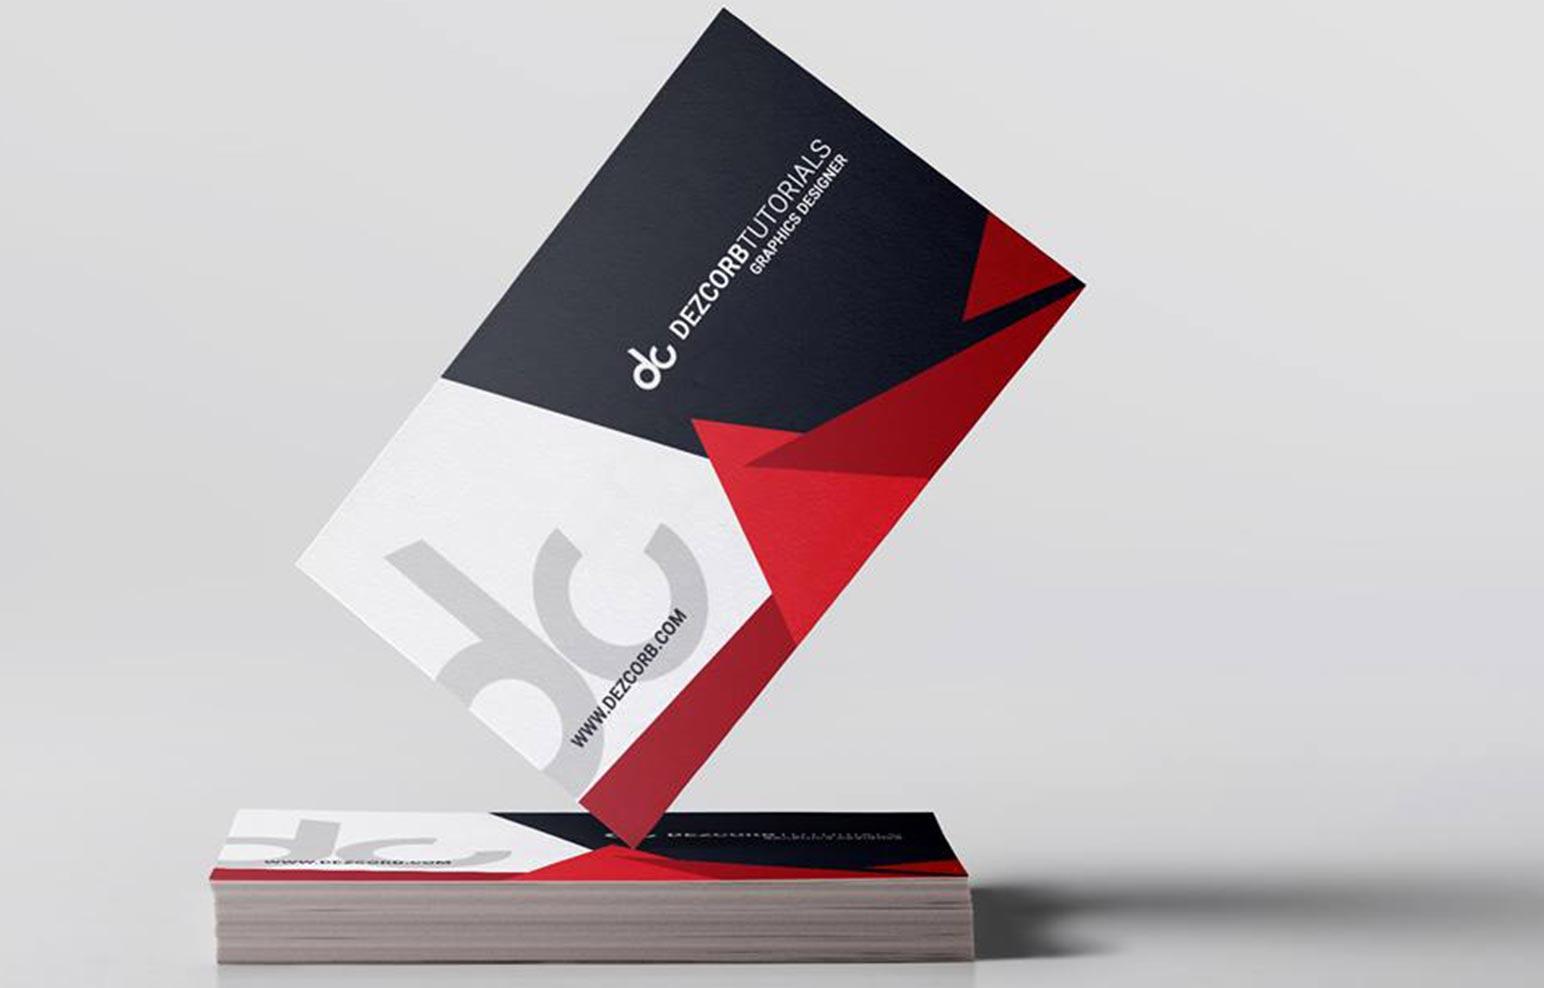 Potrebni vi se vizit karti? - Graficki dizajn, Потребни ви се визит карти? - Графички дизајн